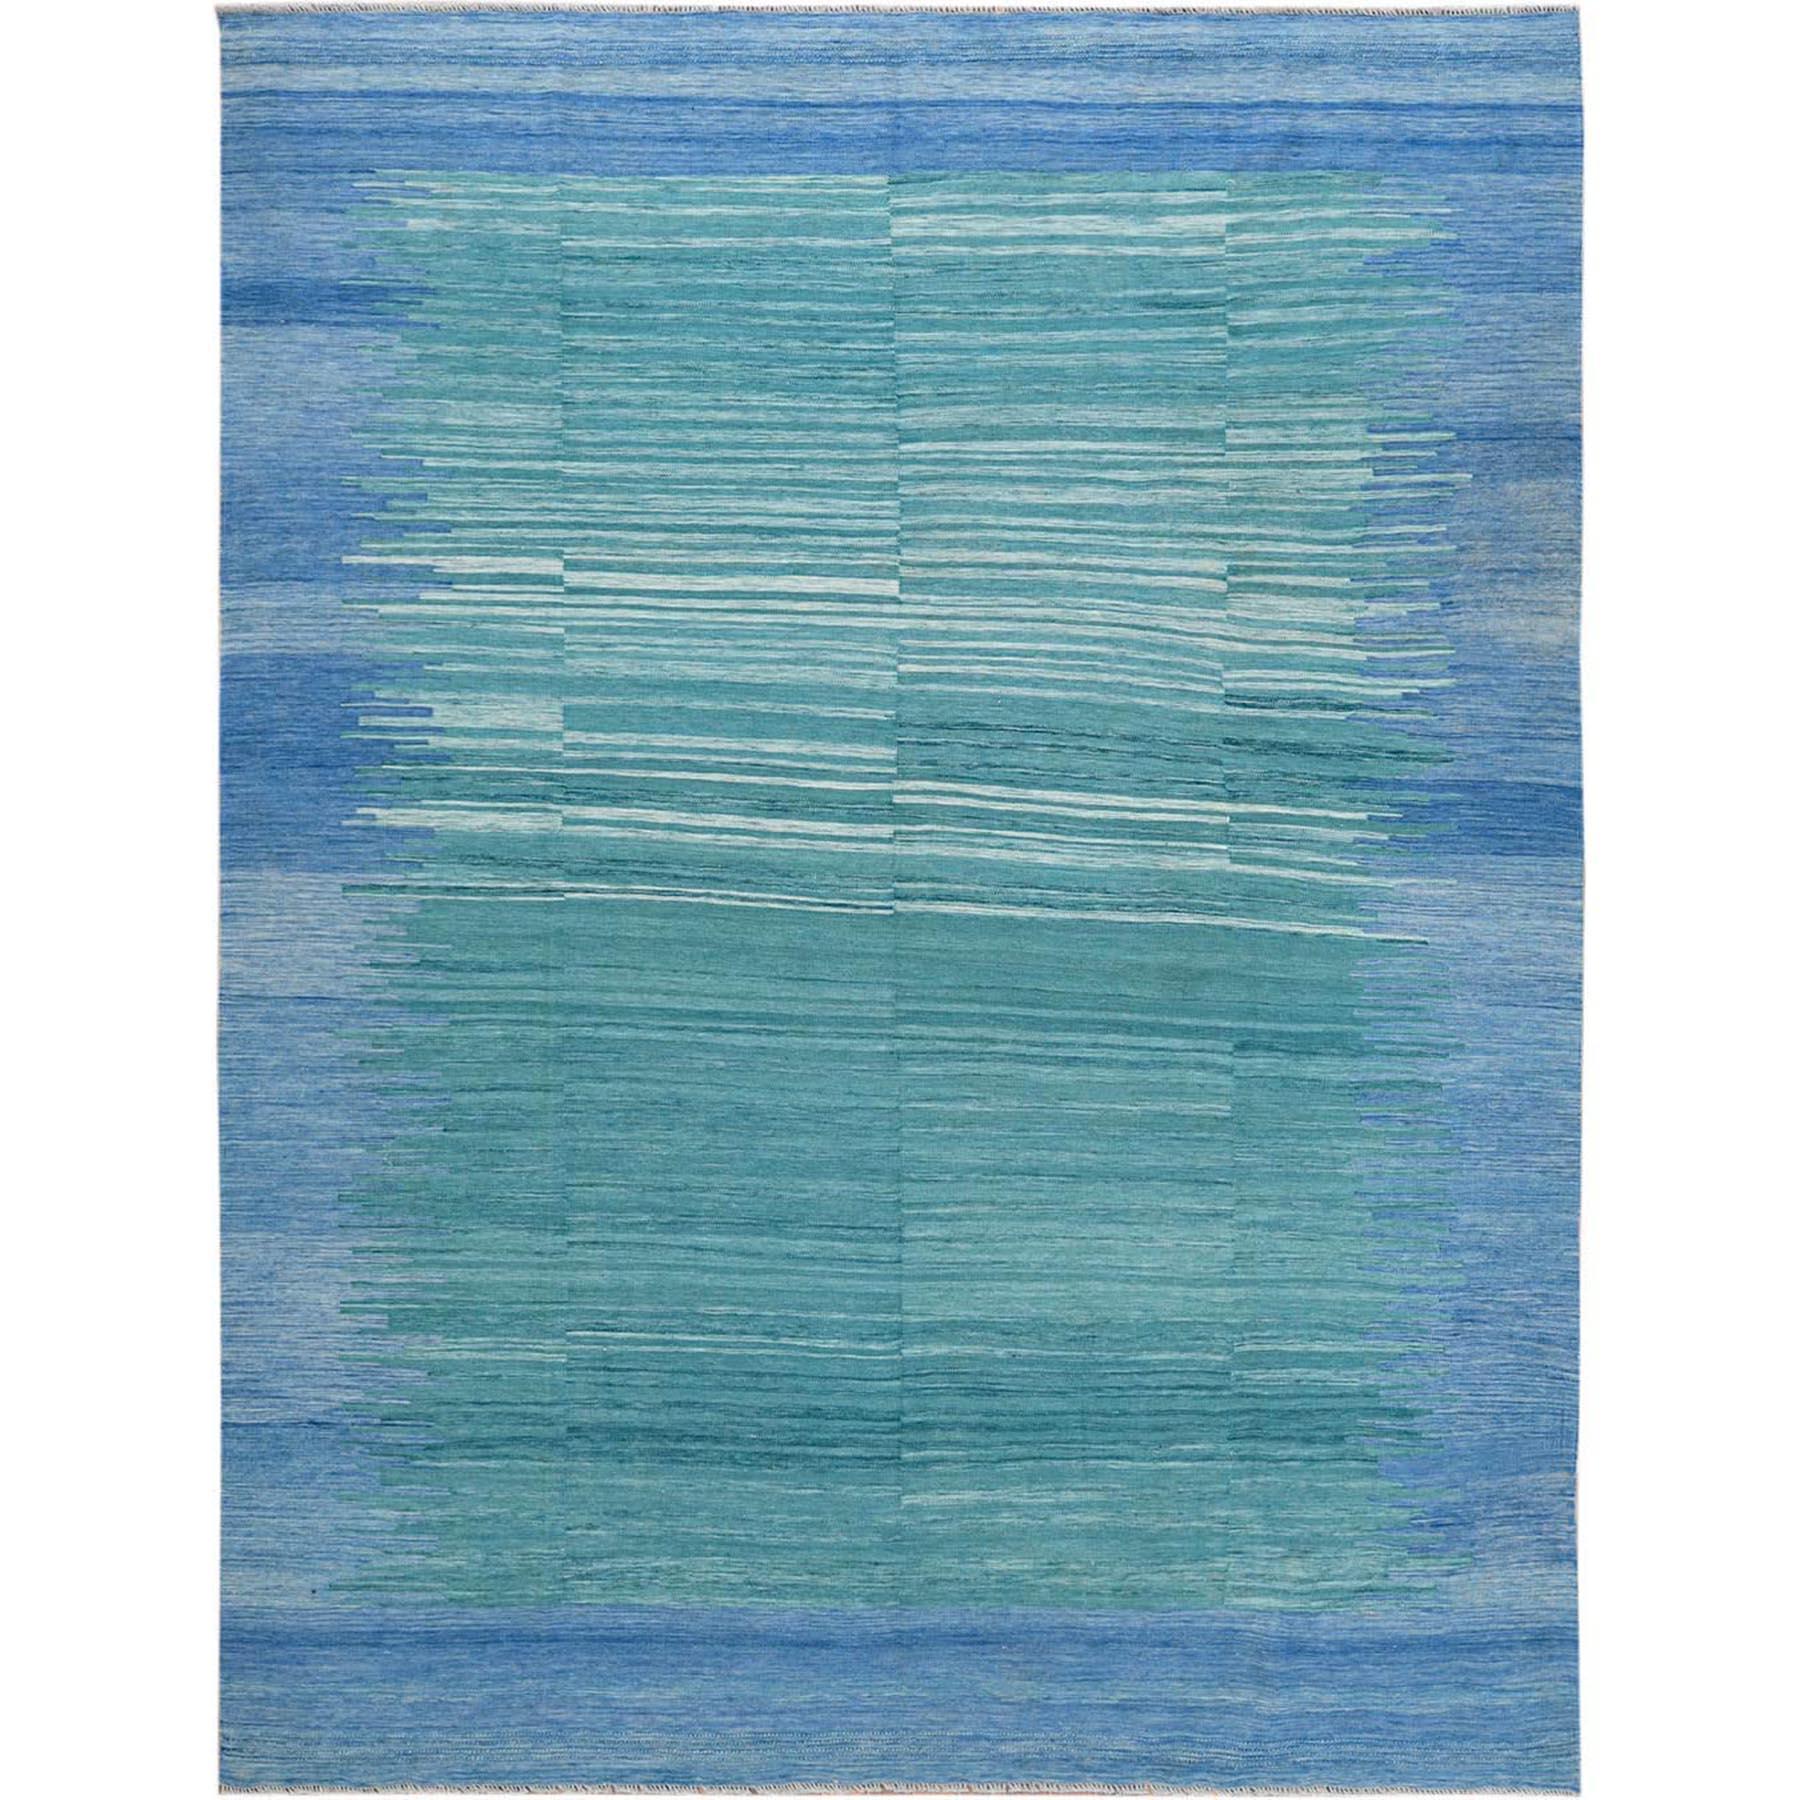 "9'2""x12' THE AQUAMARINE Flat Weave Kilim Natural Wool Reversible Hand Woven Oriental Rug"